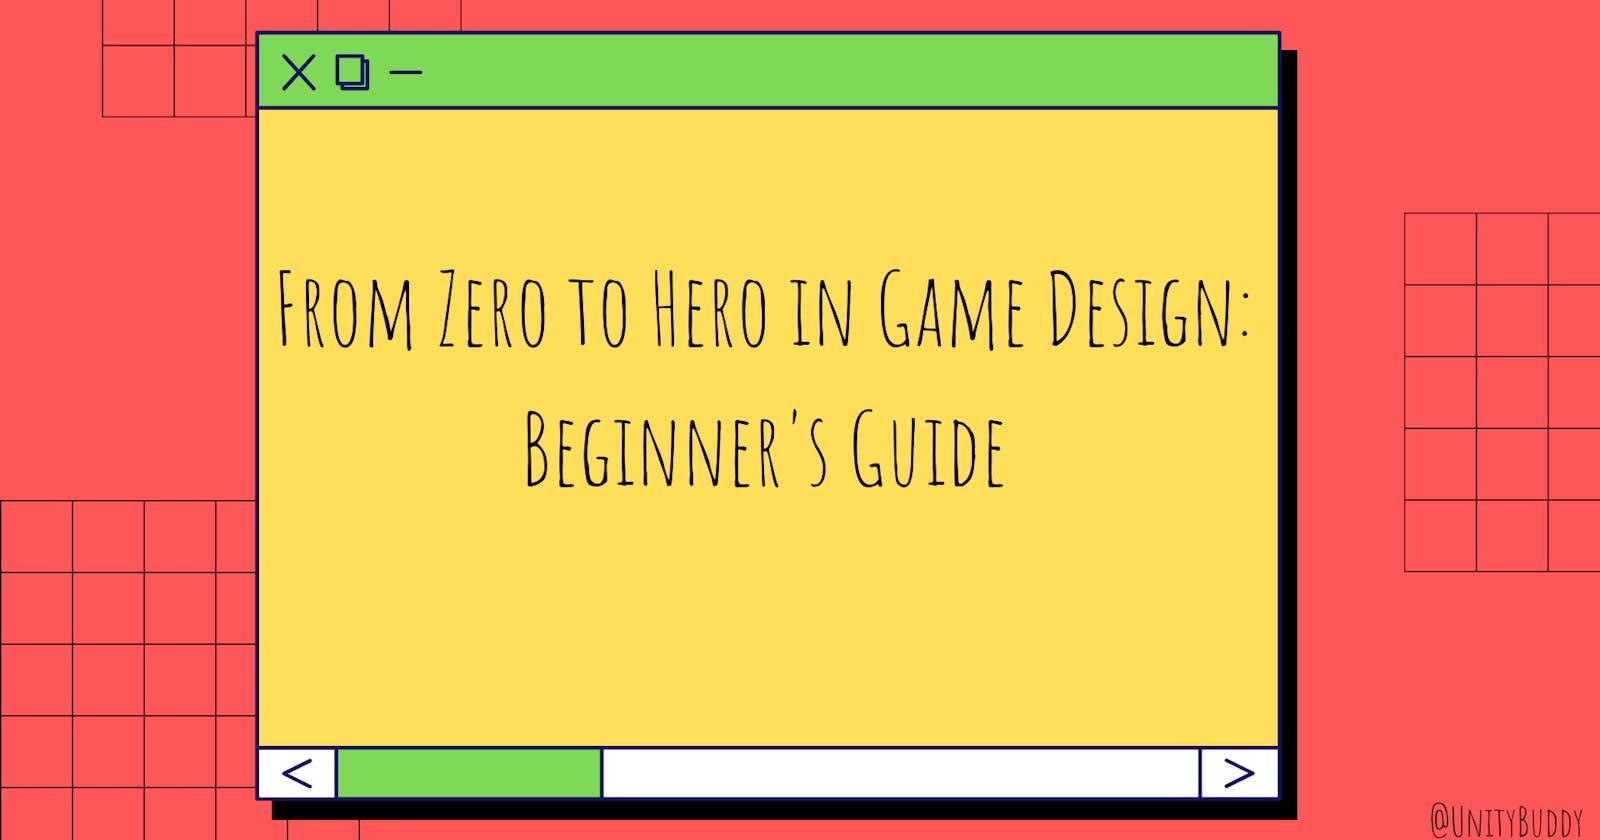 From Zero to Hero in Game Design: Beginner's Guide